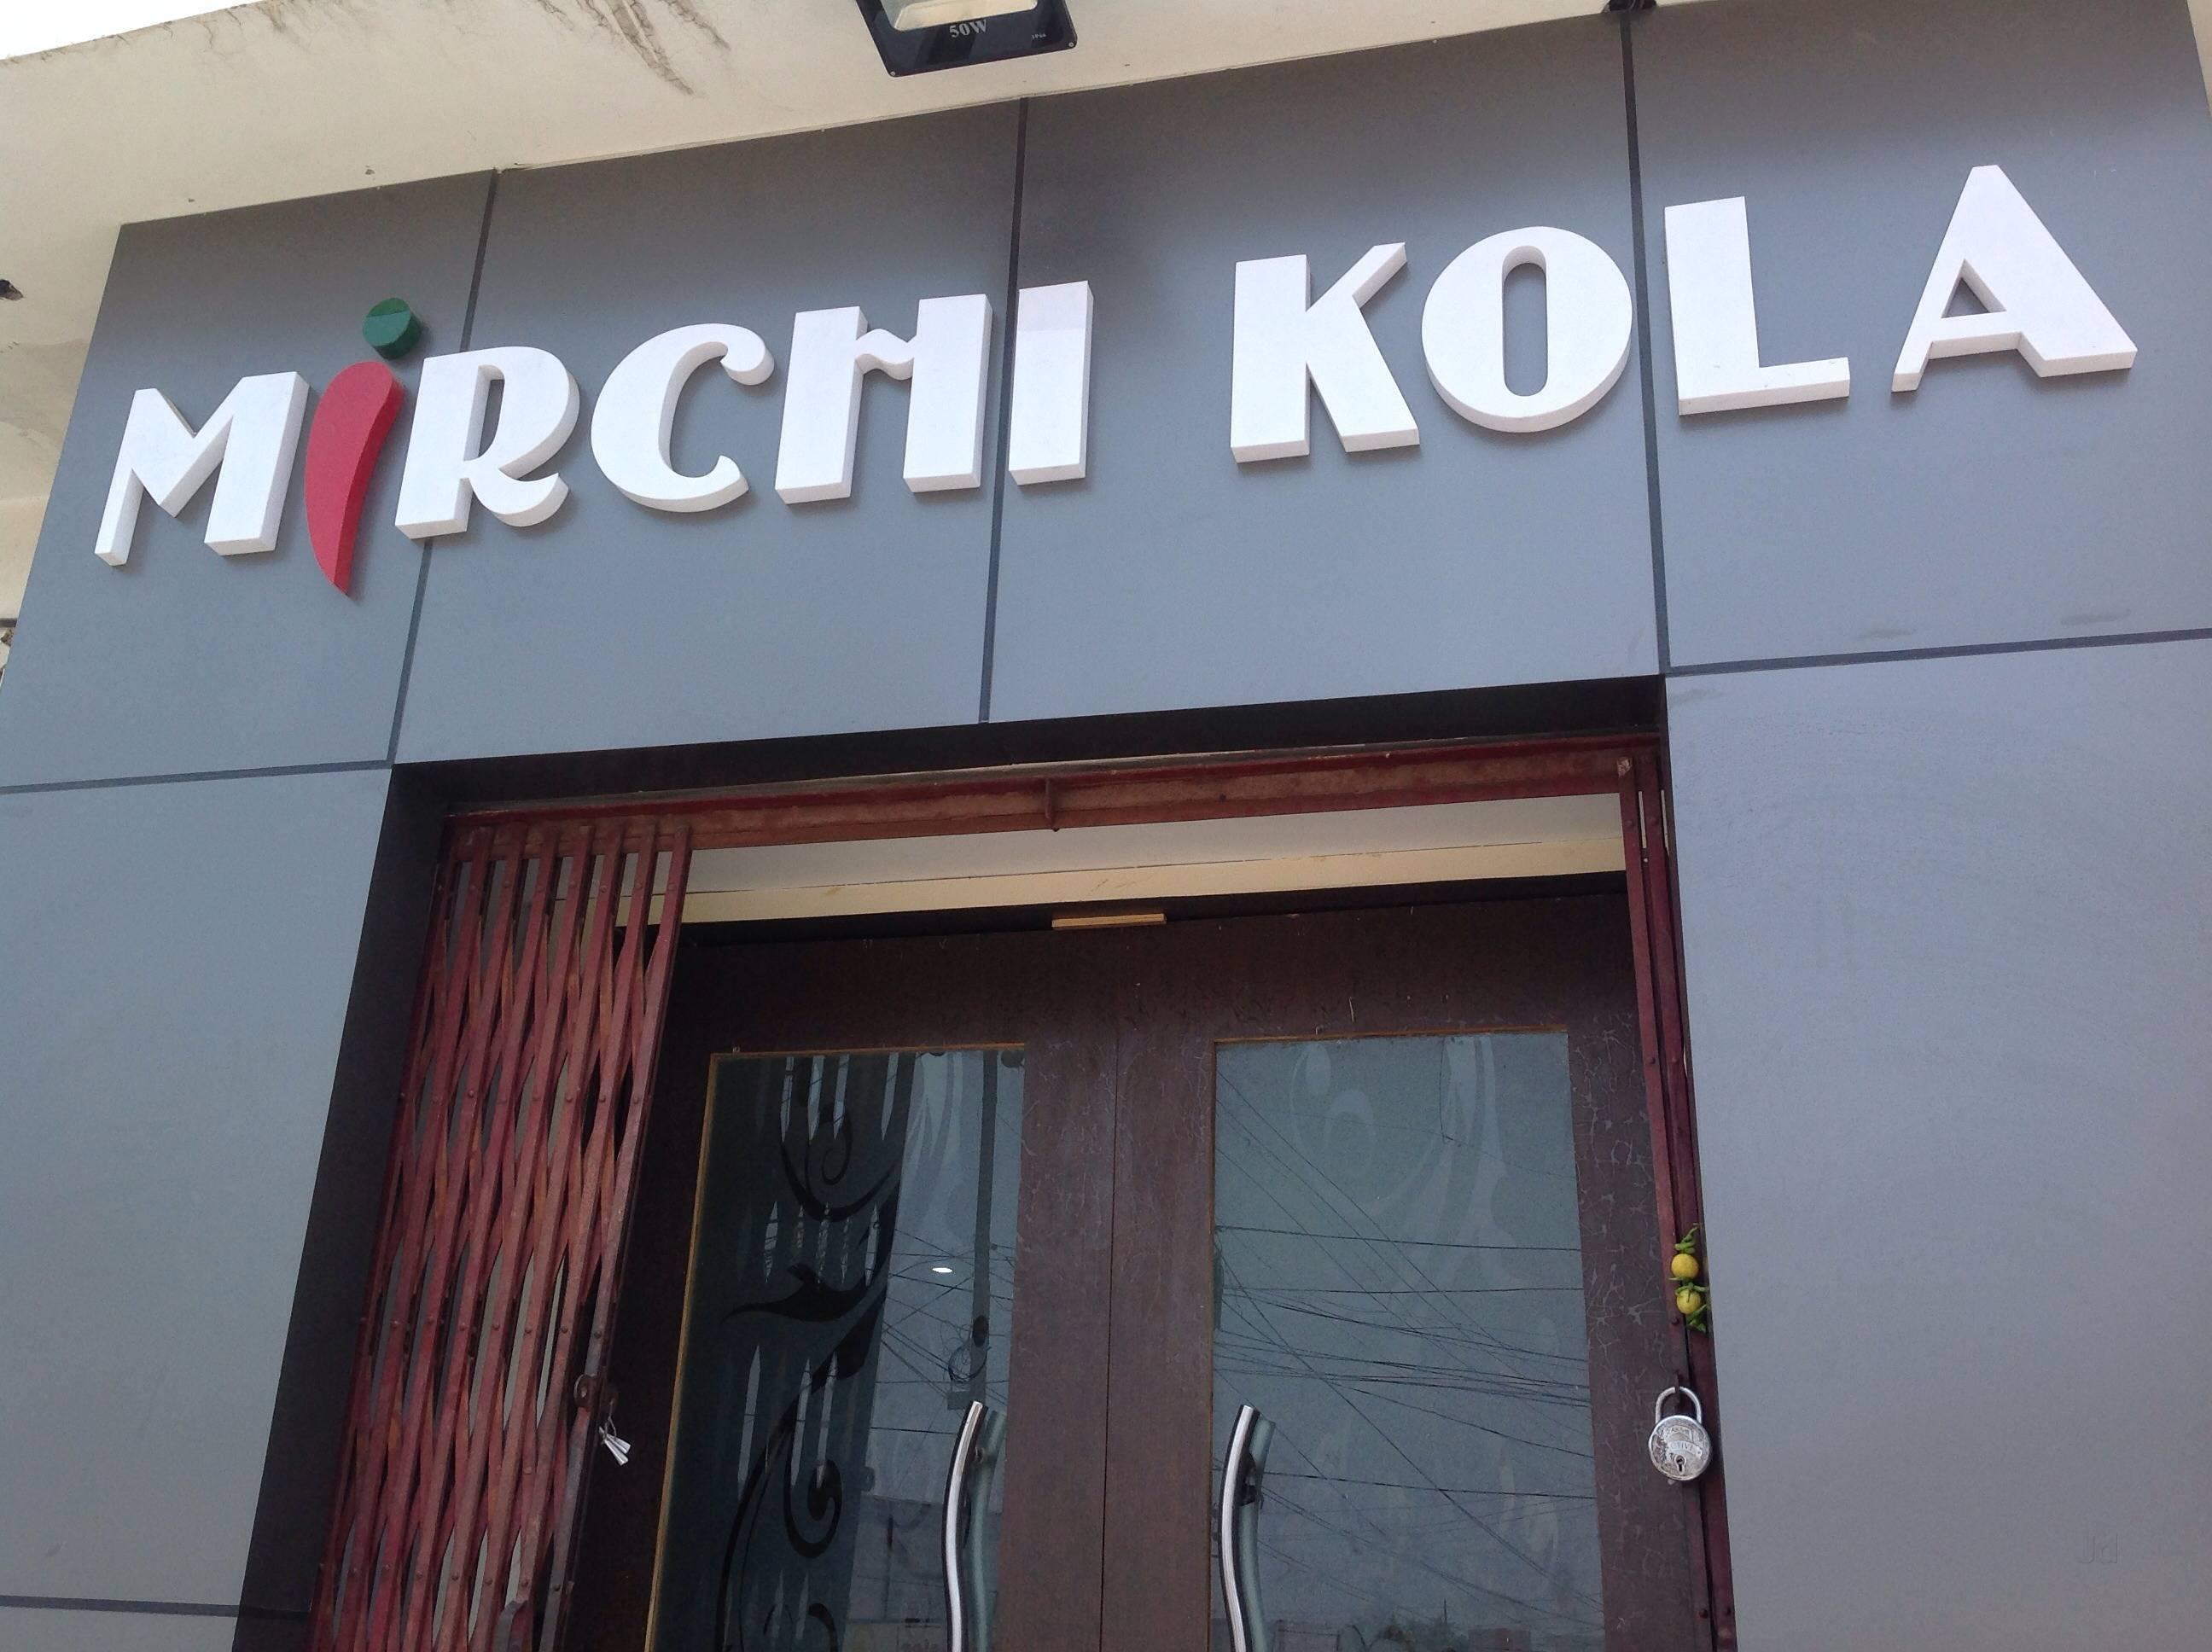 Mirchi Kola - Aashiana - Lucknow Image